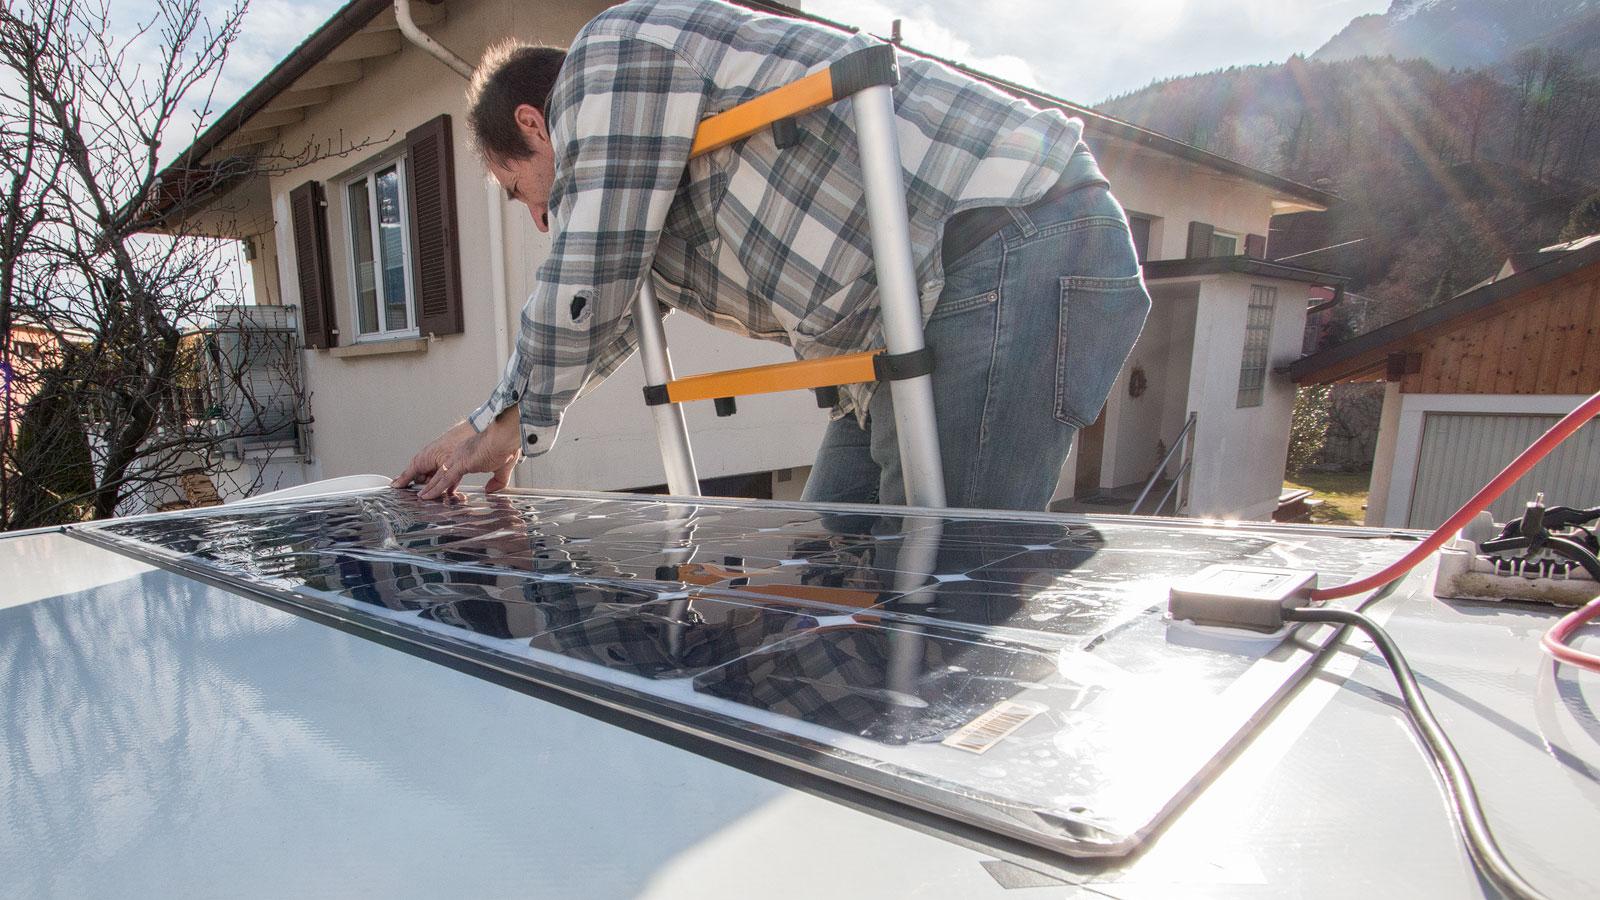 Solarpanels andrücken